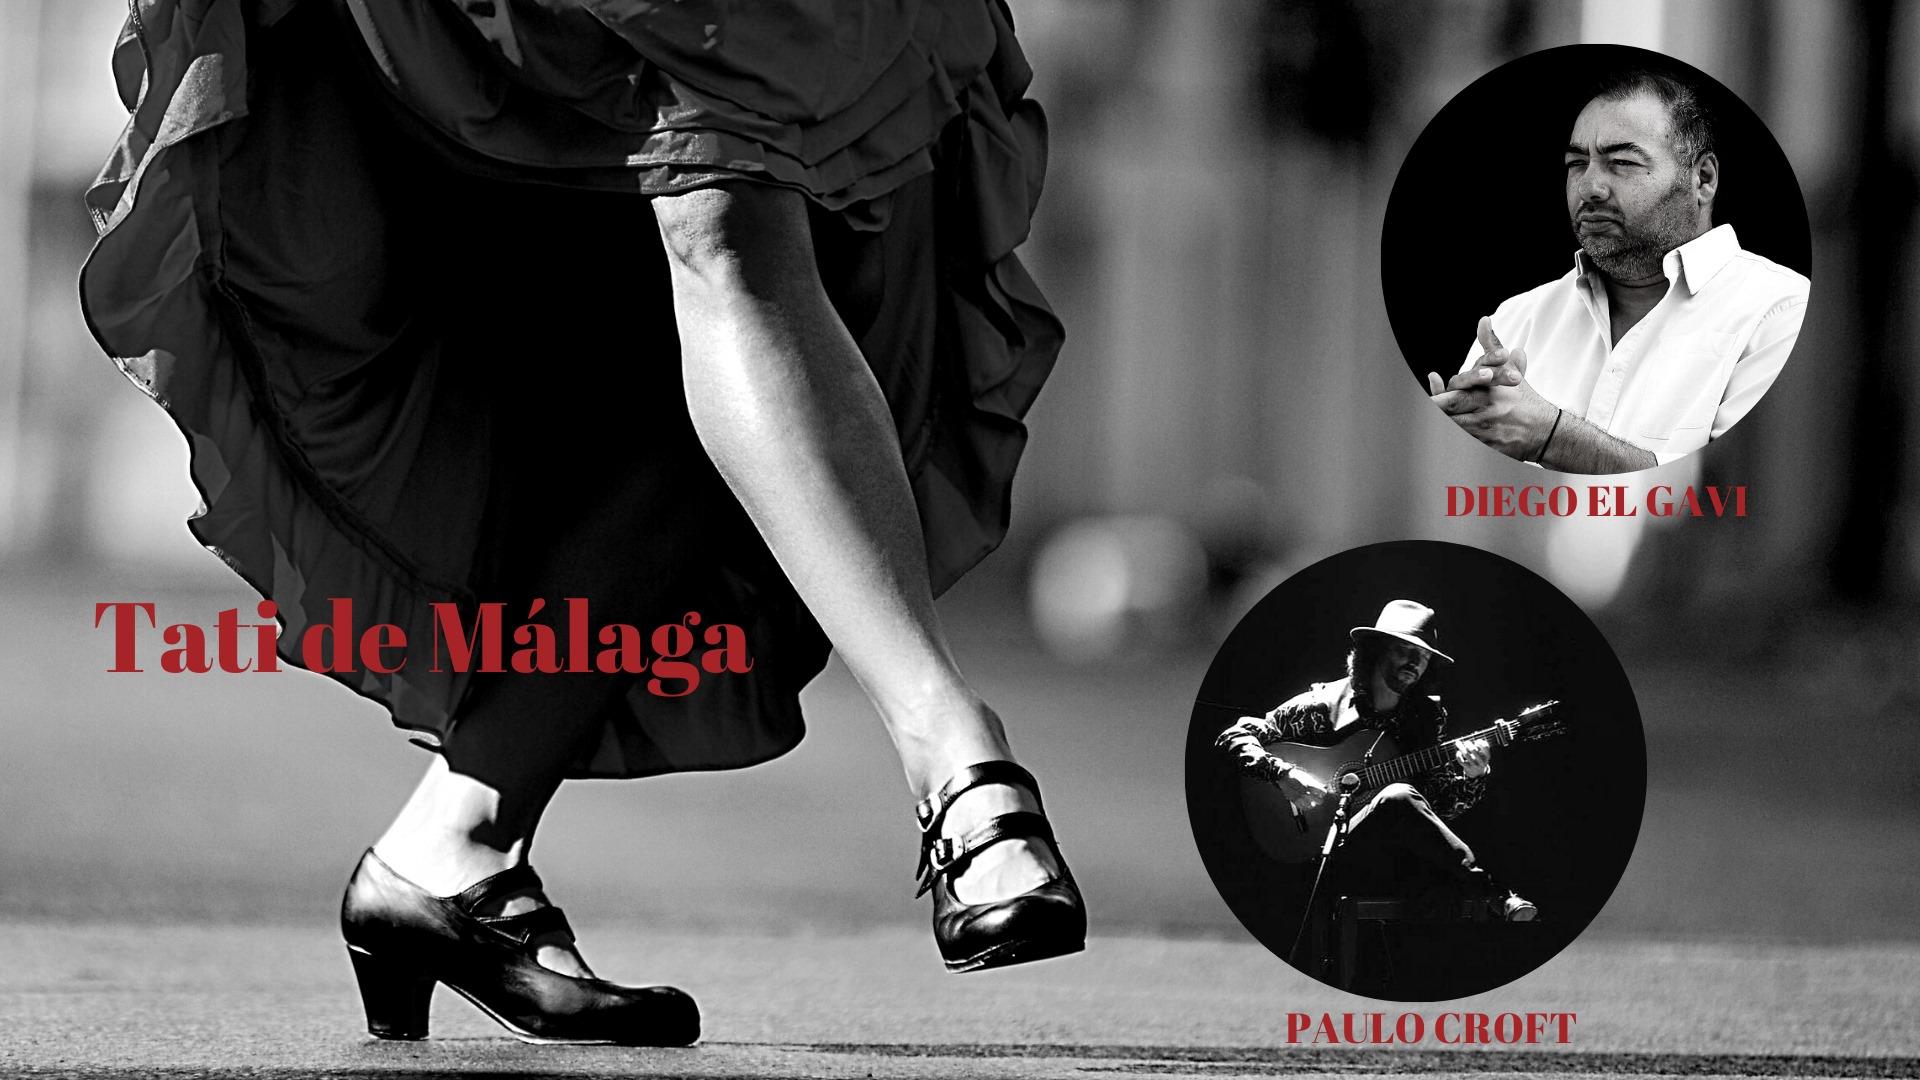 Baile Flamenco: Tati de Málaga convida Paulo Croft e Diego El Gavi